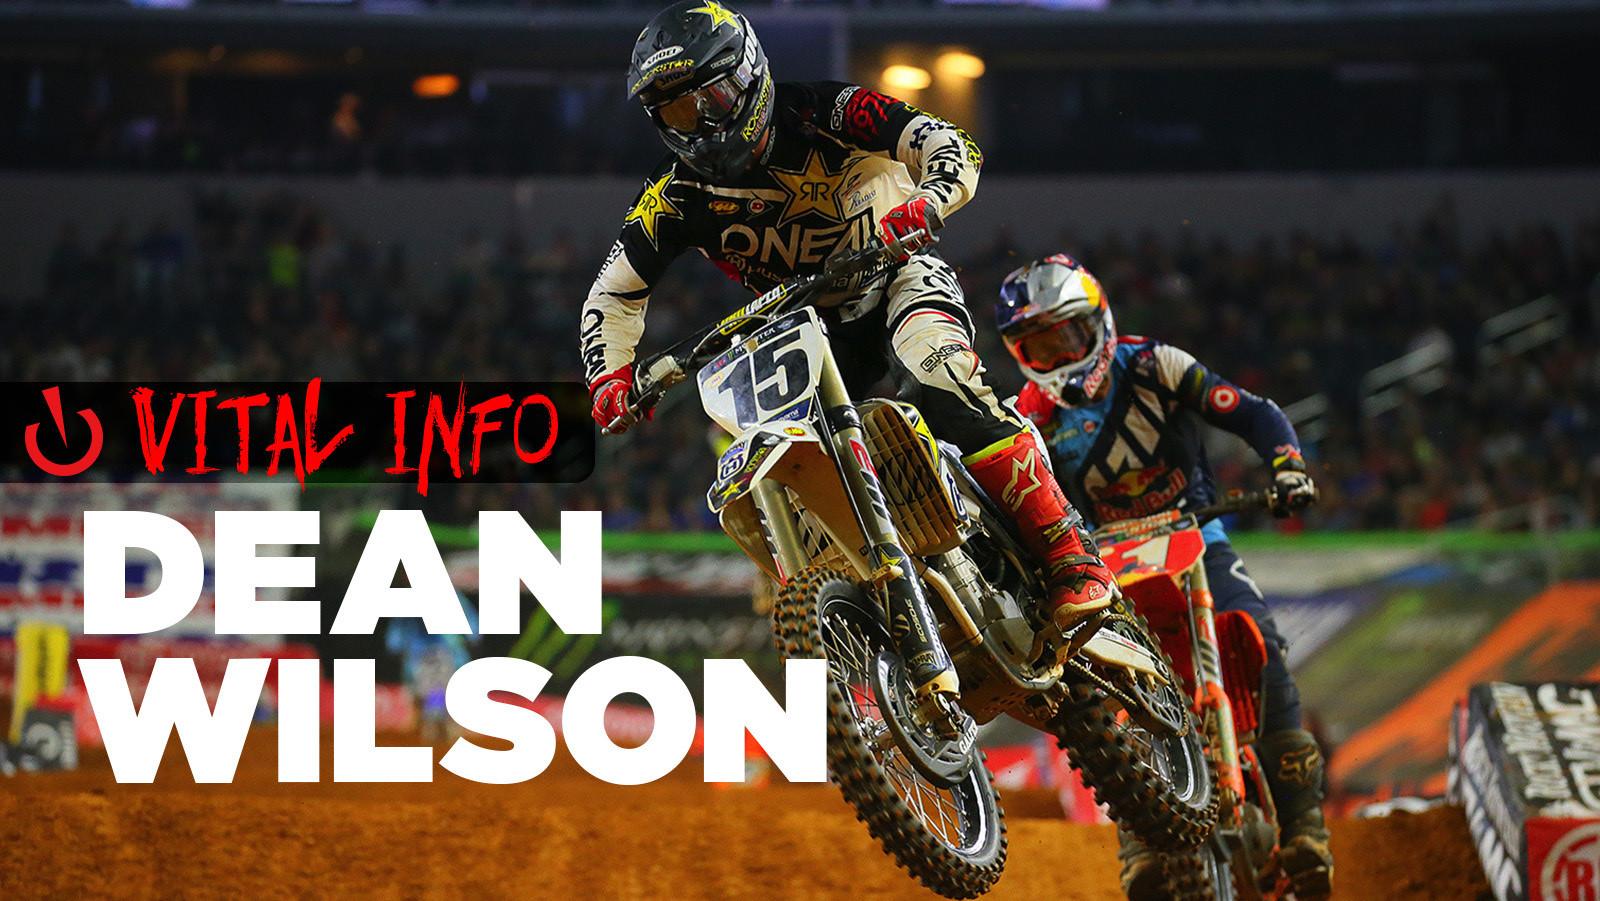 Vital Info: Dean Wilson